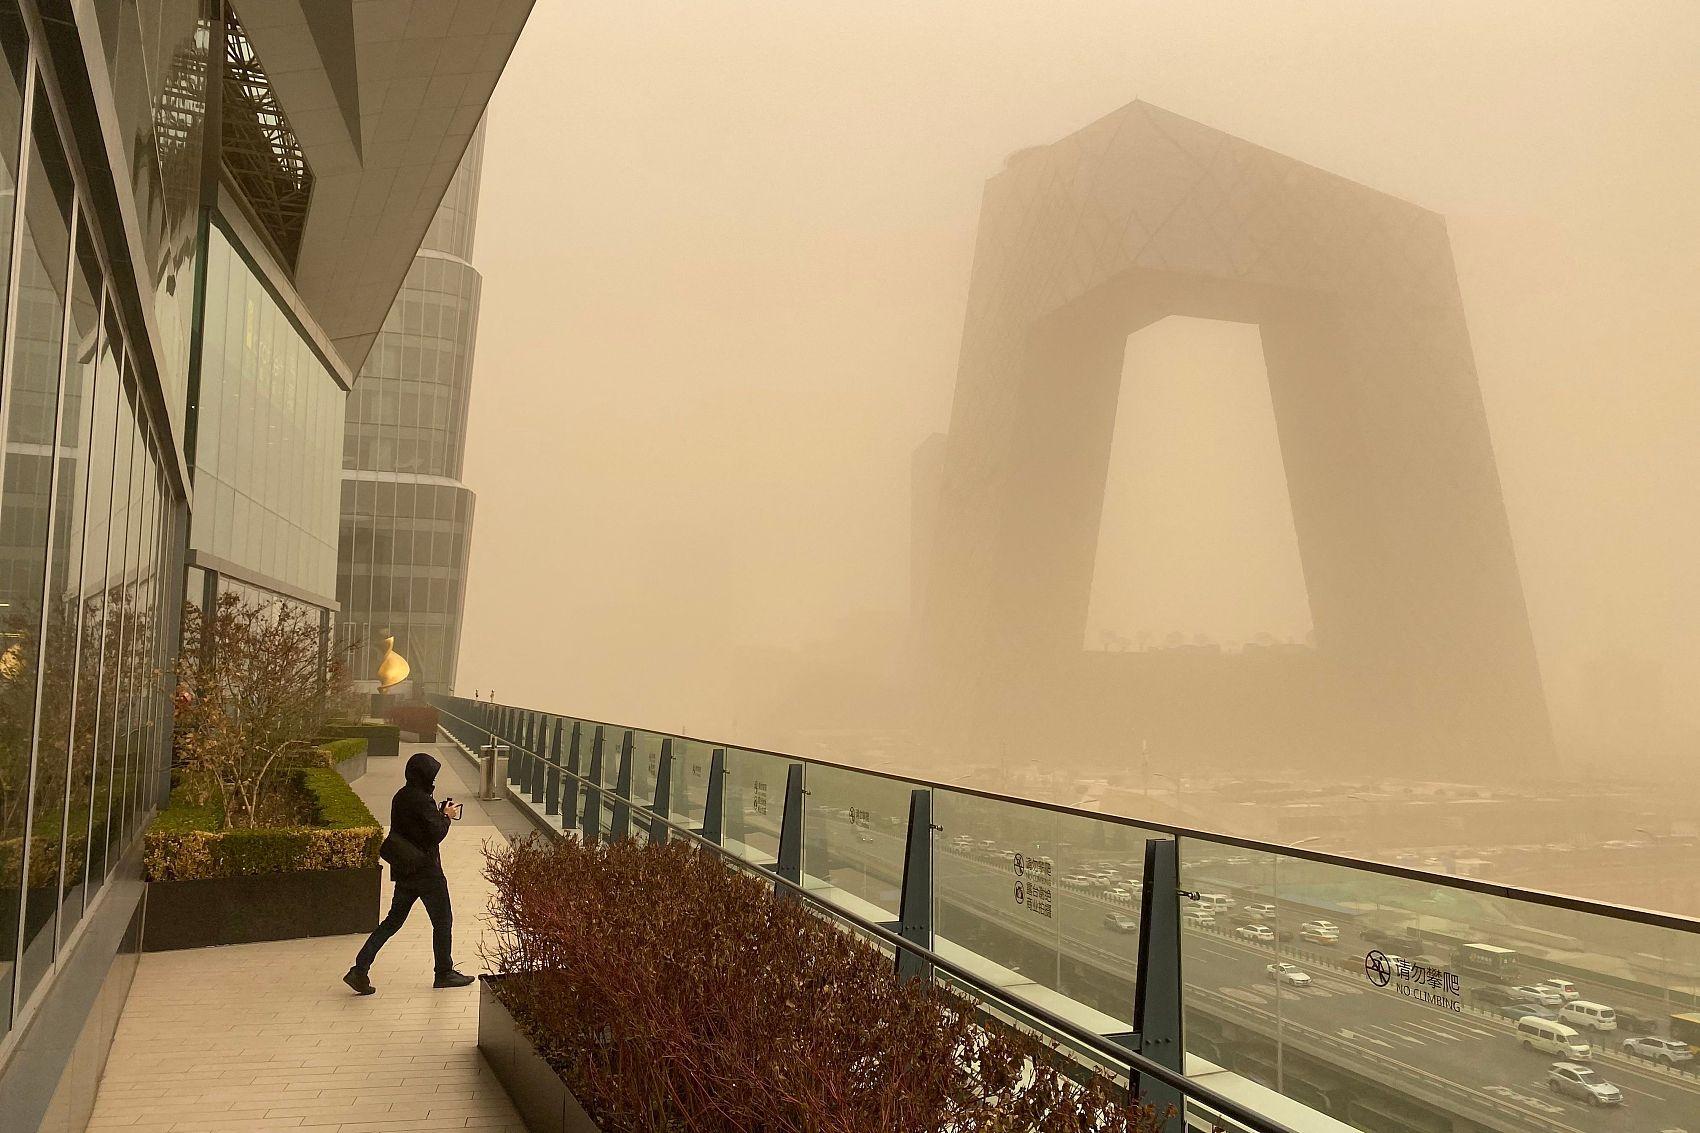 Strong sandstorm hits northern China